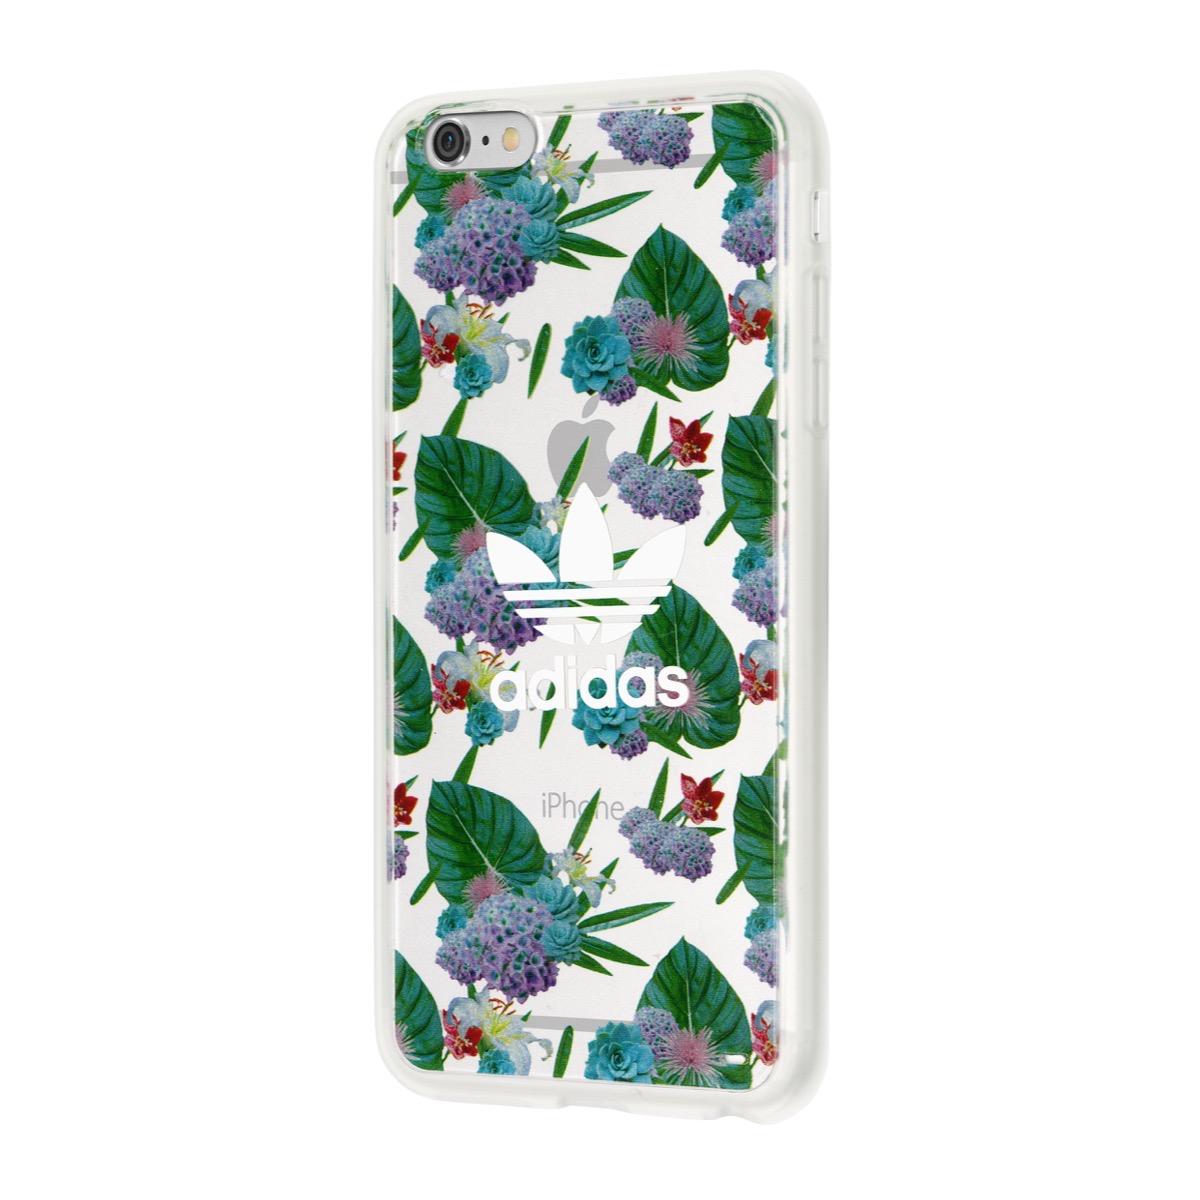 1f06e94010 【取扱終了製品】adidas Originals Clear Case iPhone 6s Plus Flower White